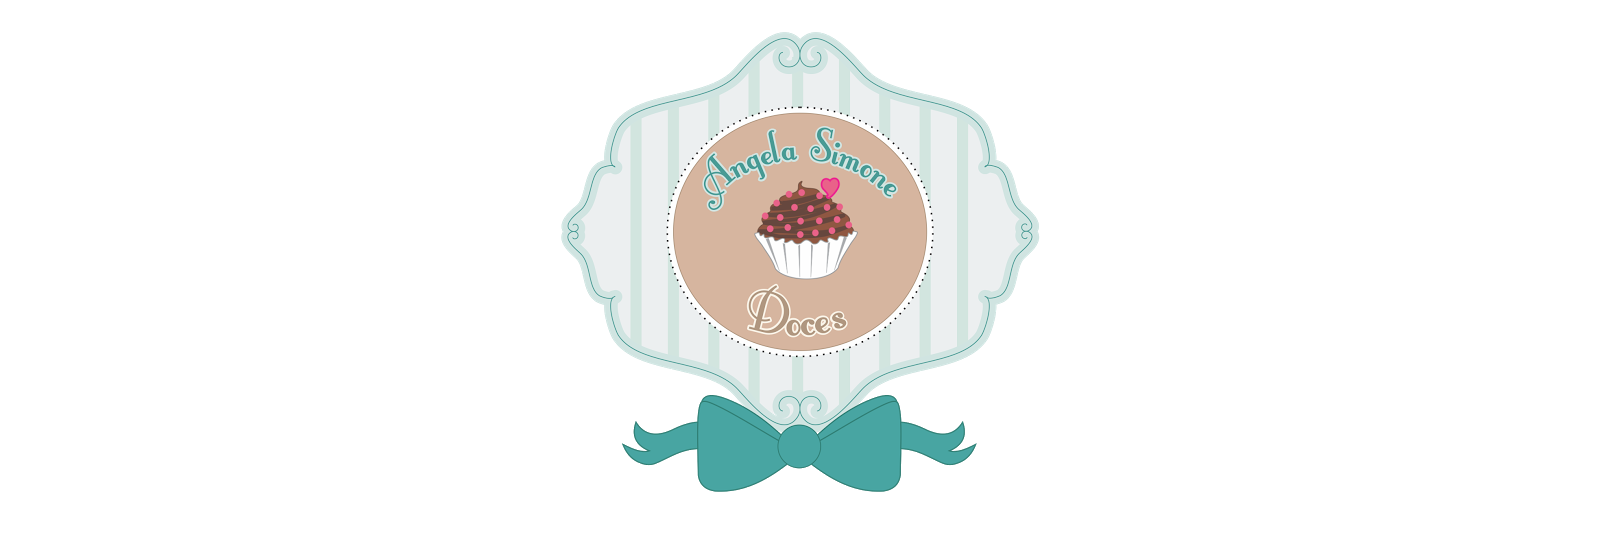 Angela Simone Doces